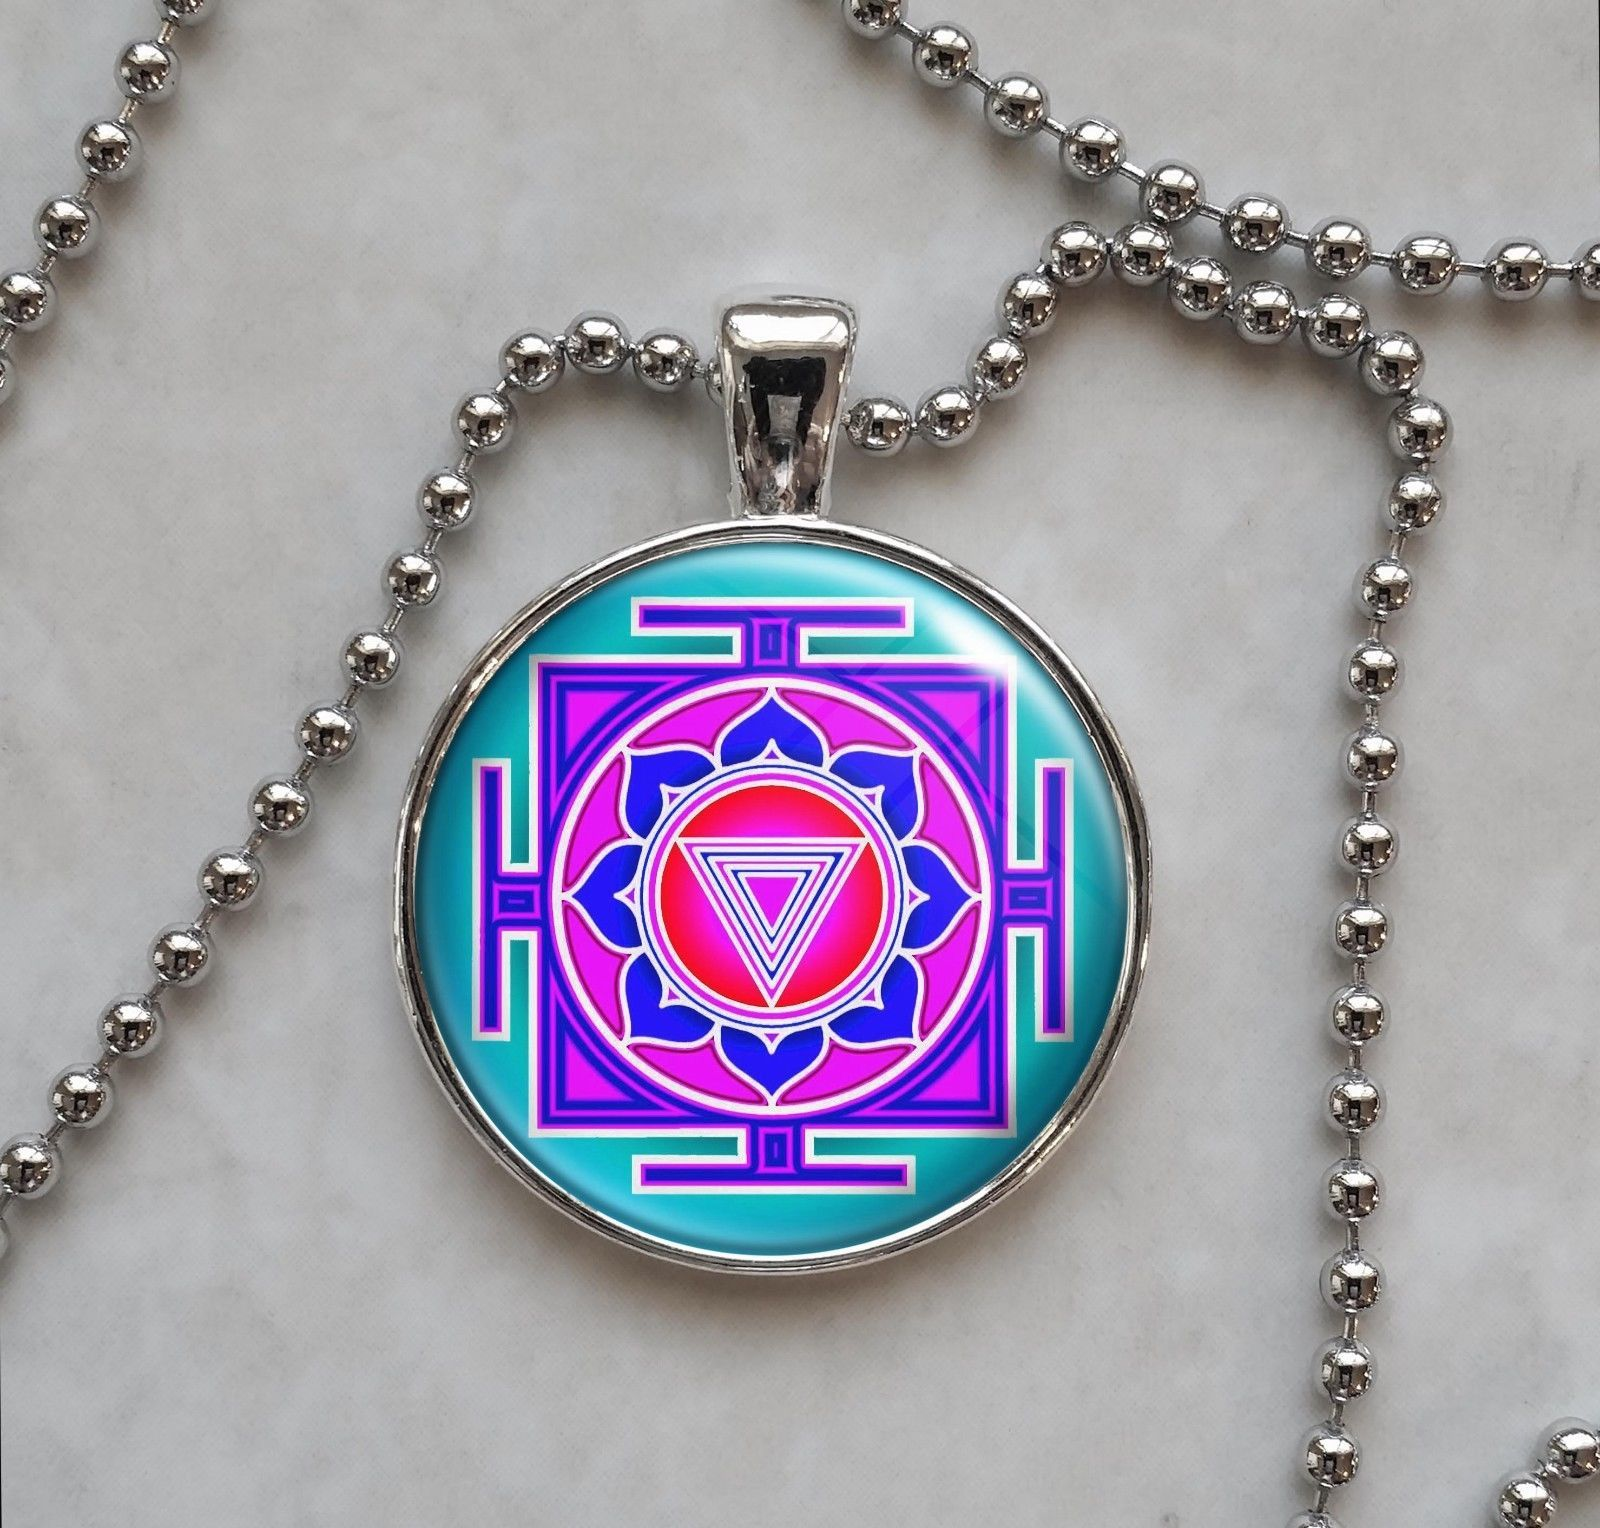 Kali Yantra Pendant Necklace